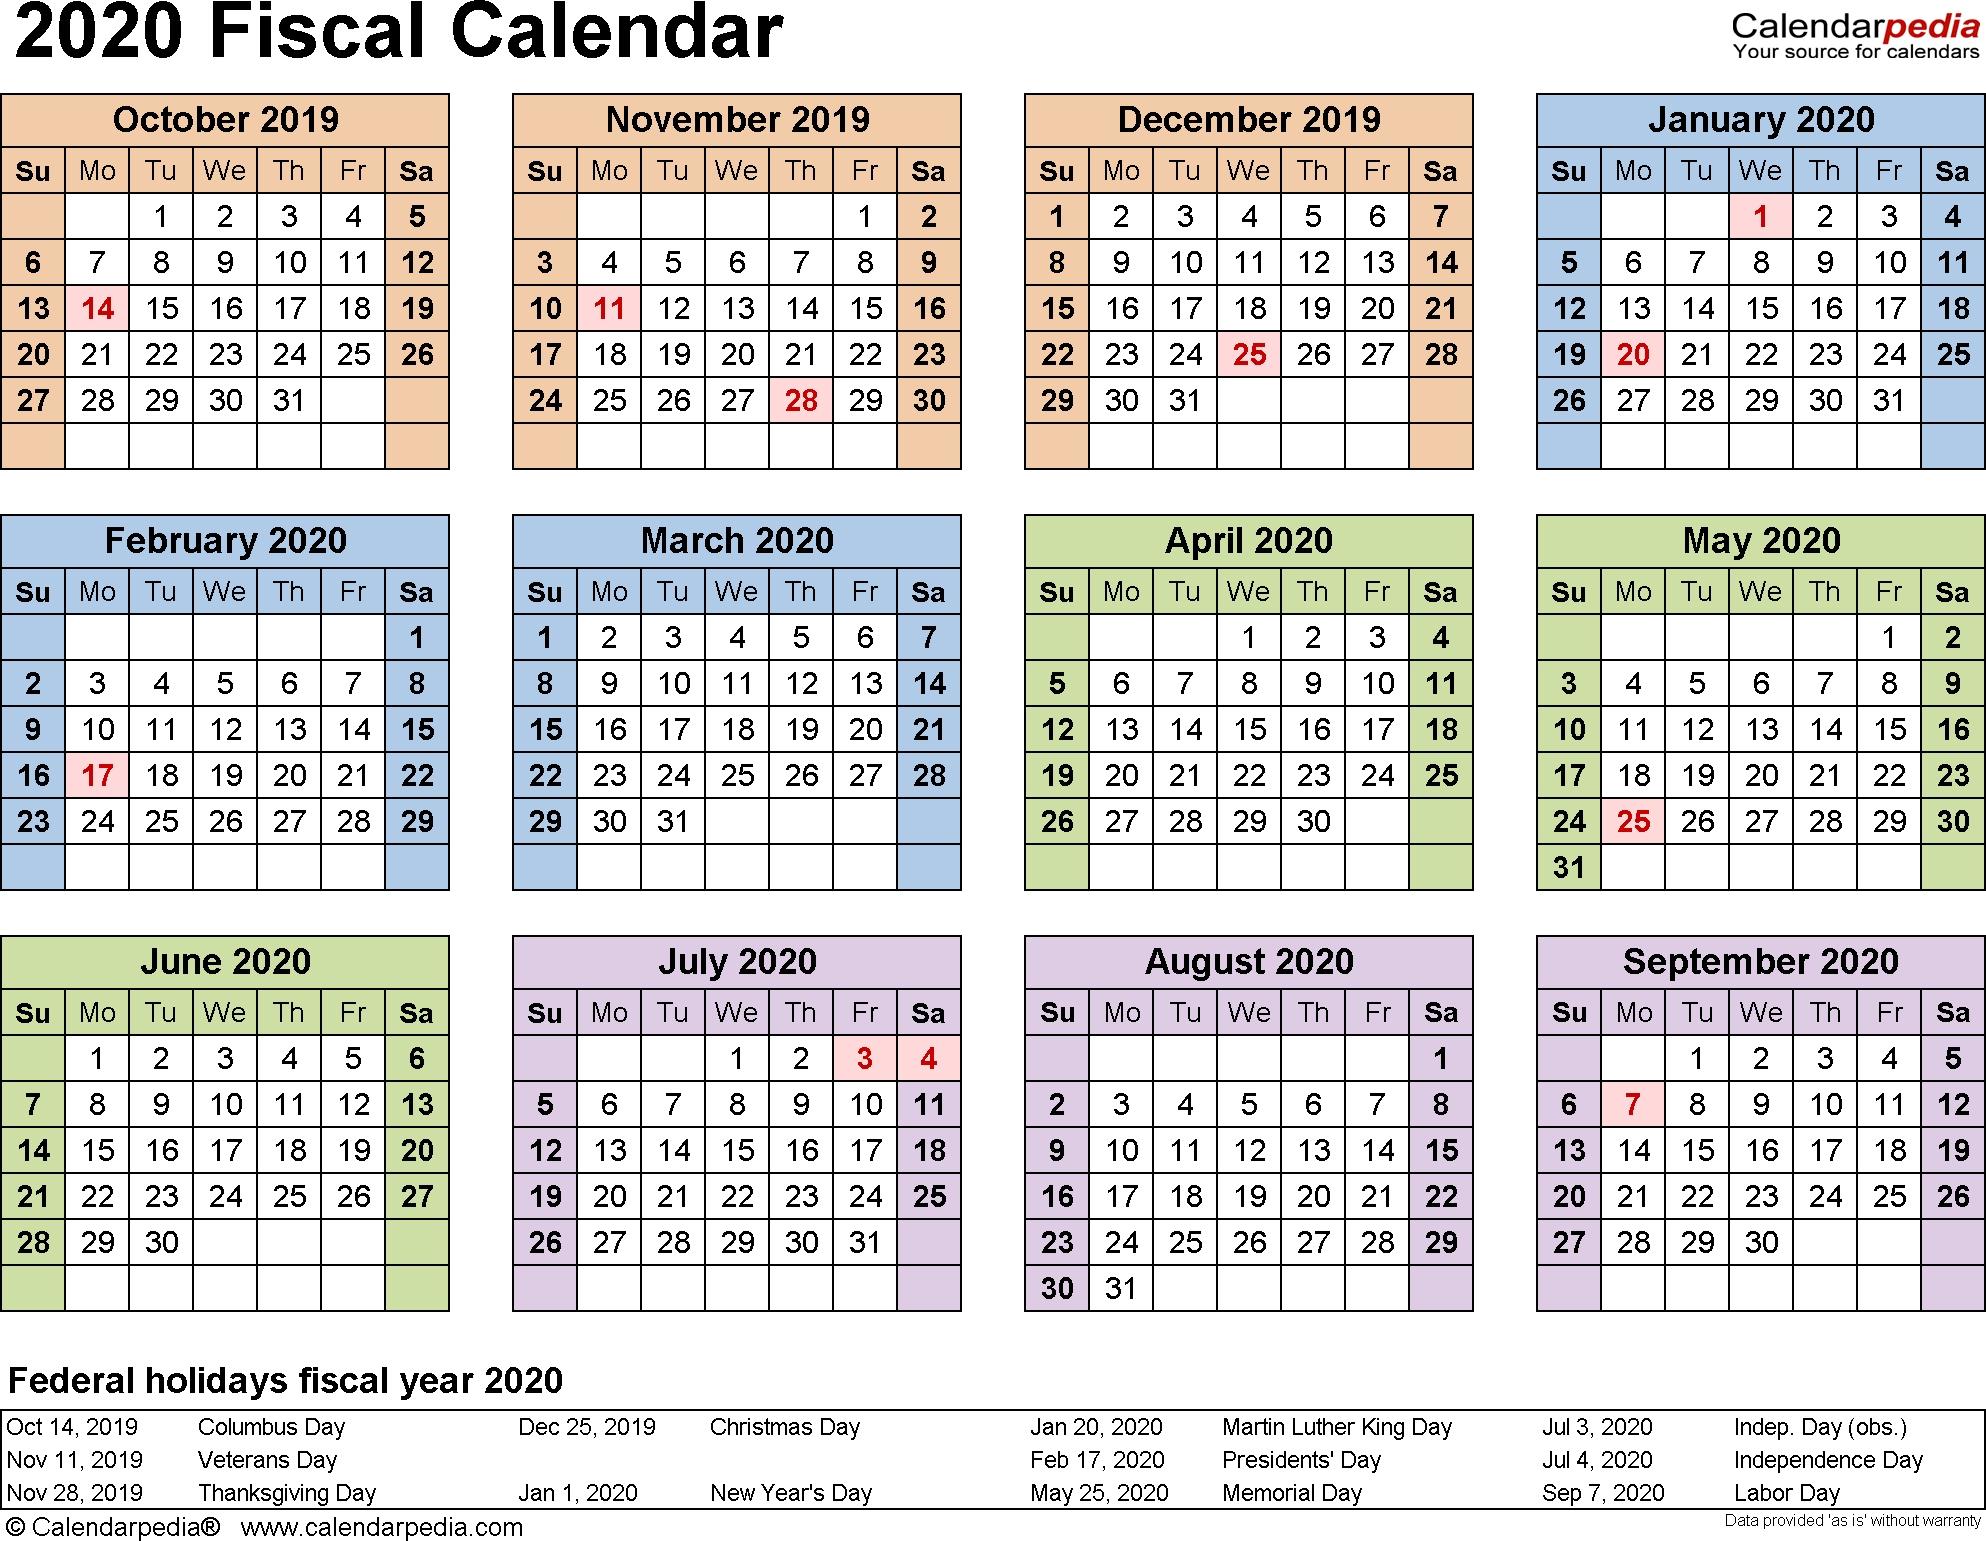 Retail Calander 2020 - Calendar Inspiration Design with Hmrc Tax Week Calendar 2019 2020